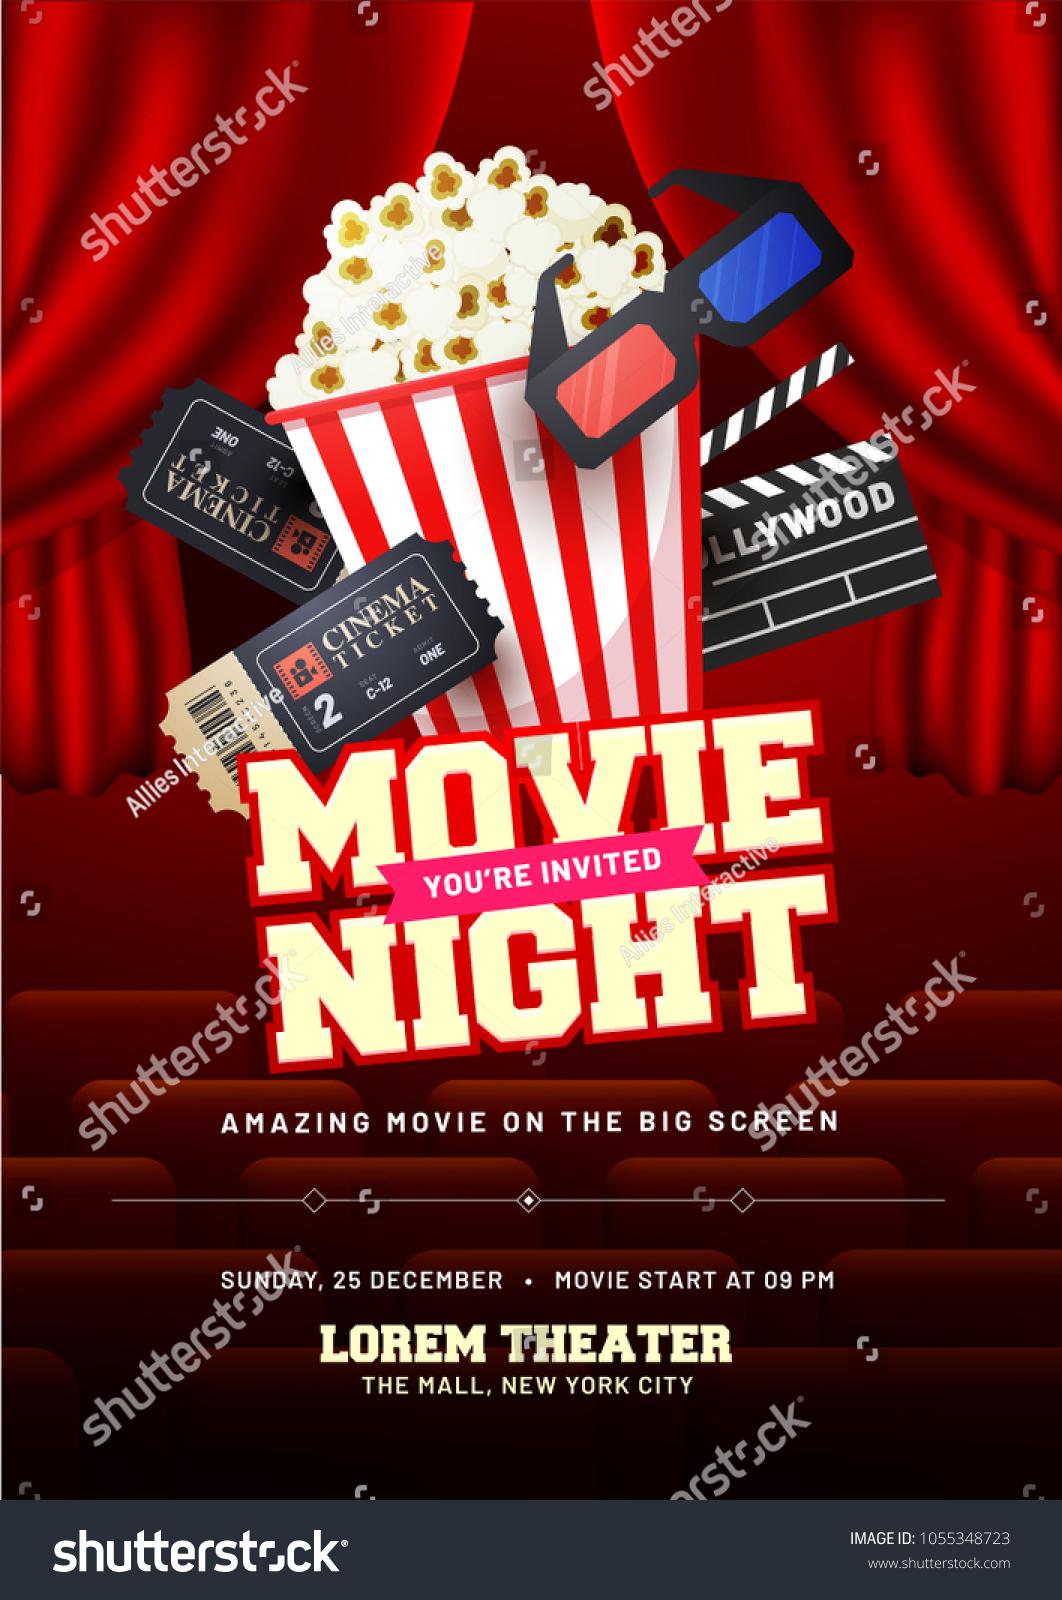 movie night concept creative template cinema のベクター画像素材